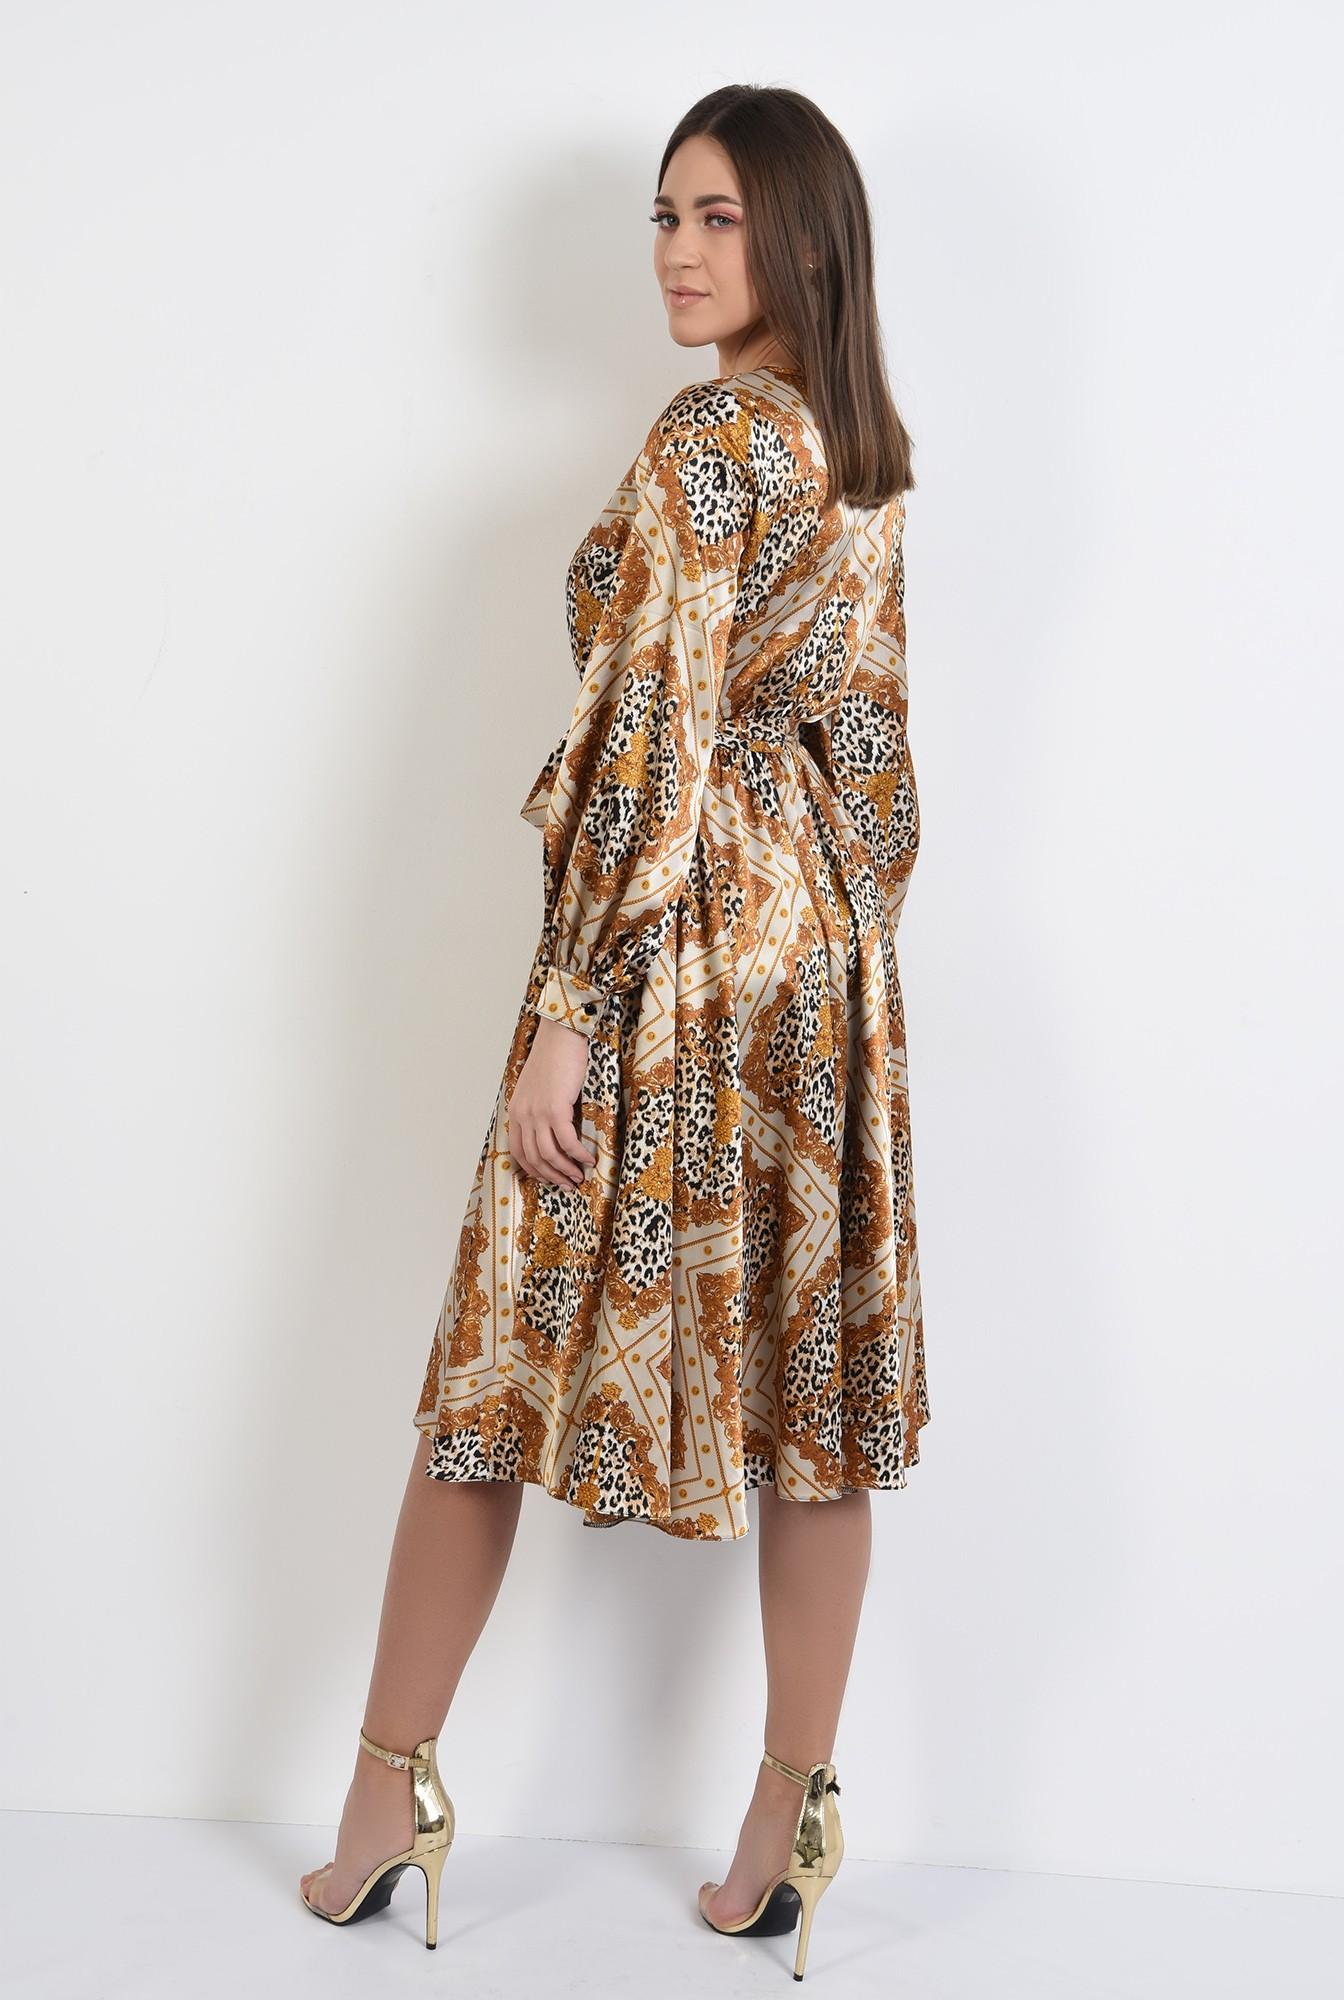 1 -  rochie eleganta, midi, evazata, cu imprimeu, animal print, rochie de primavara